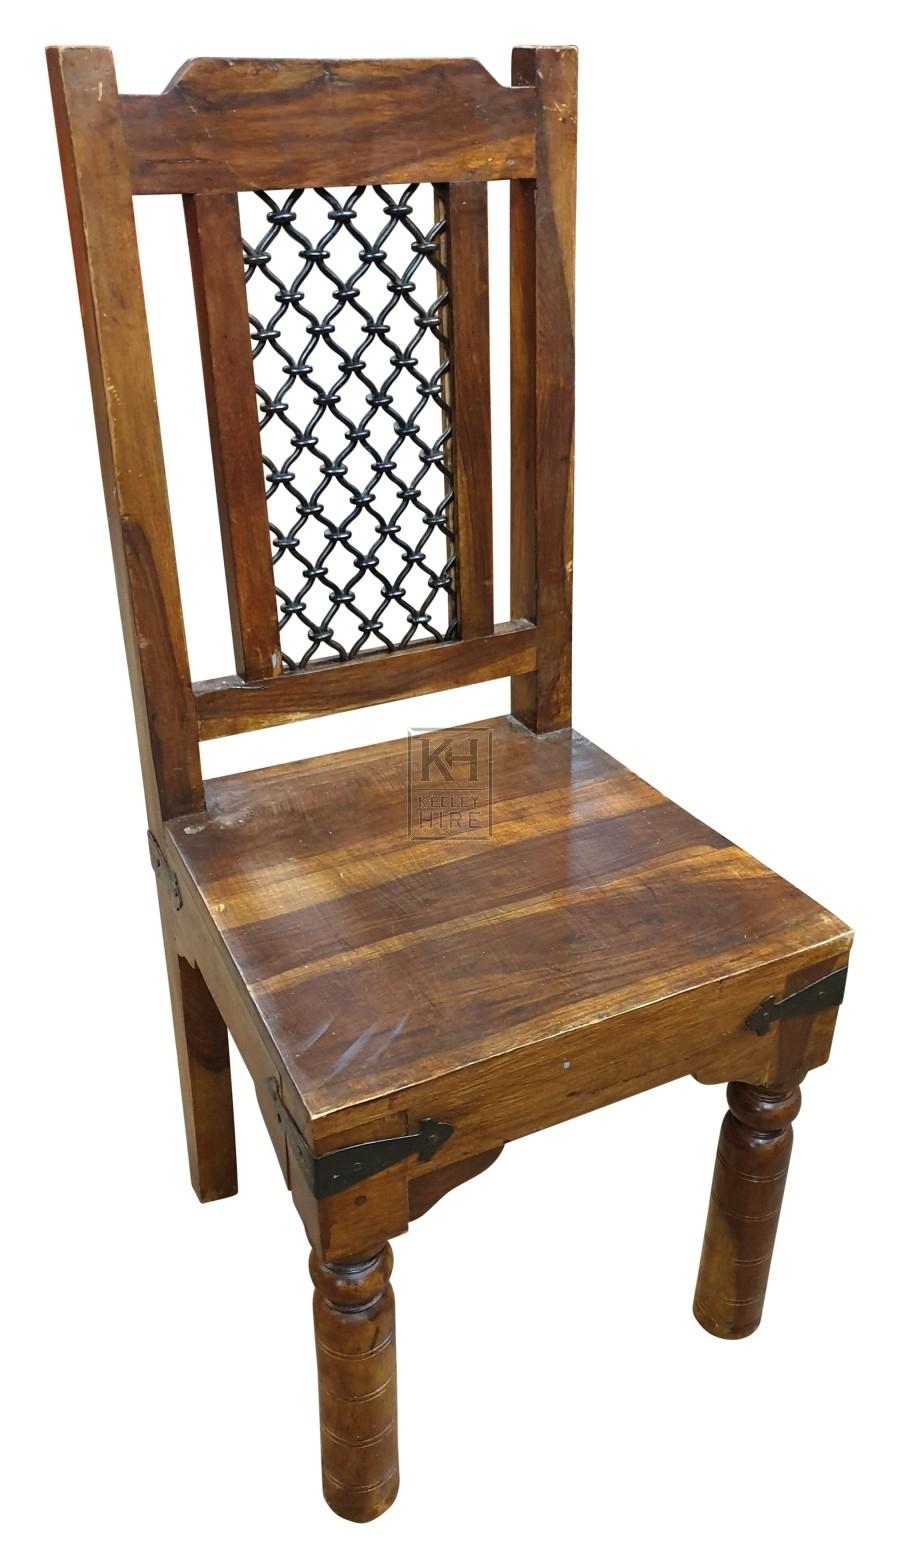 Dark wood high back chair with iron work